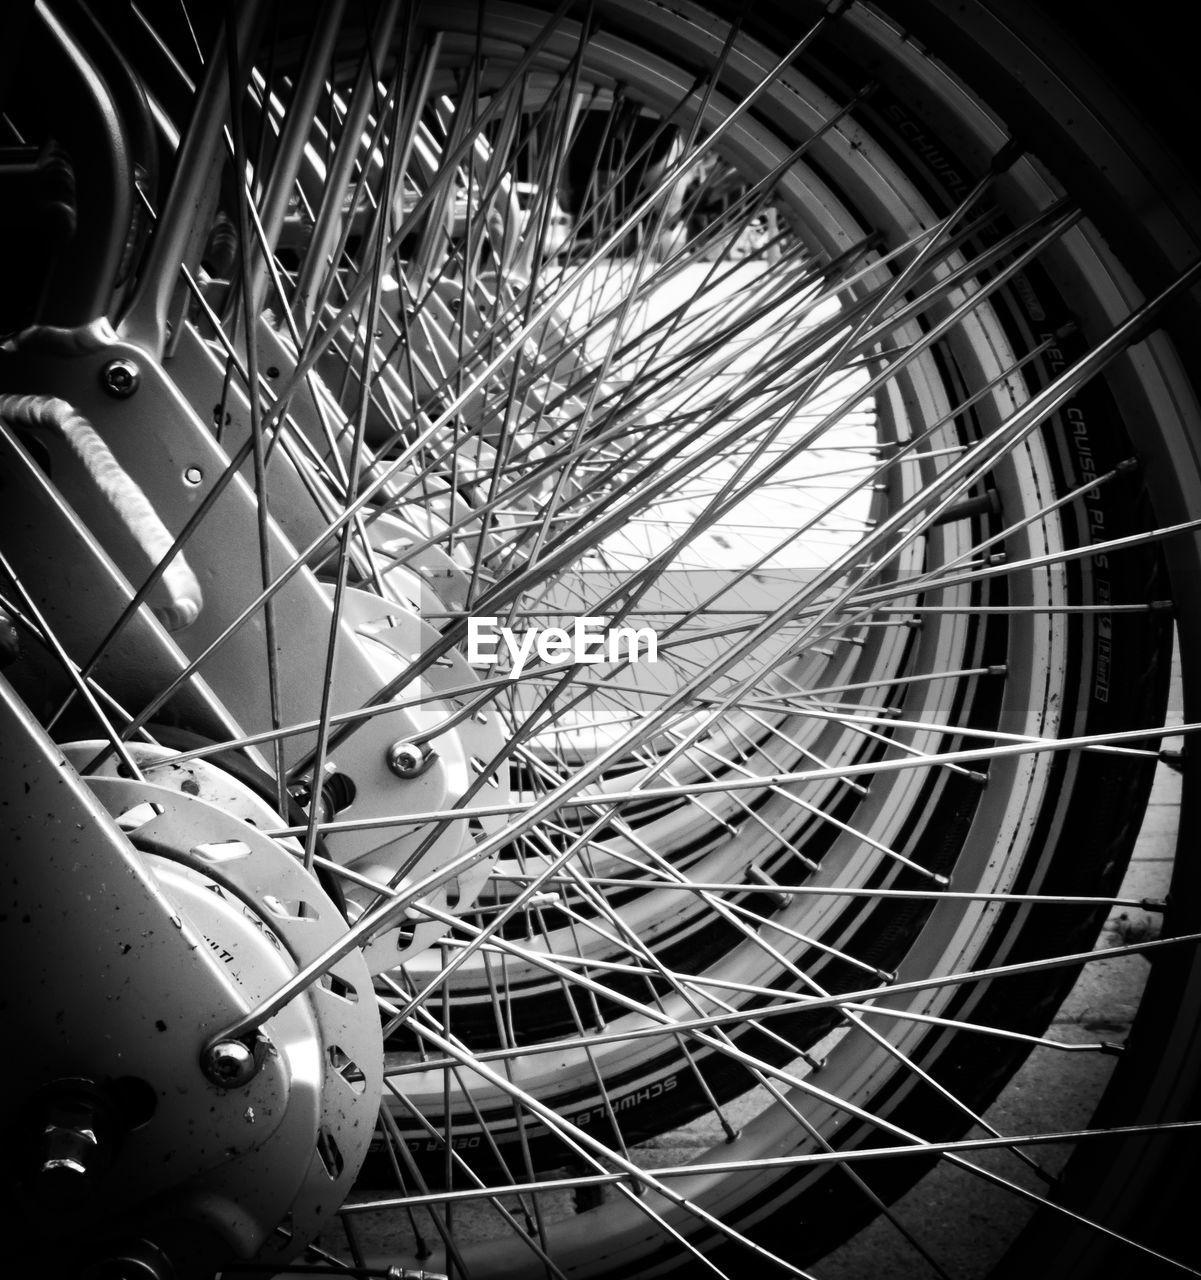 amusement park, amusement park ride, metal, bicycle, land vehicle, spoke, no people, ferris wheel, wheel, transportation, mode of transportation, arts culture and entertainment, built structure, close-up, architecture, day, low angle view, outdoors, fairground, shape, tire, steel